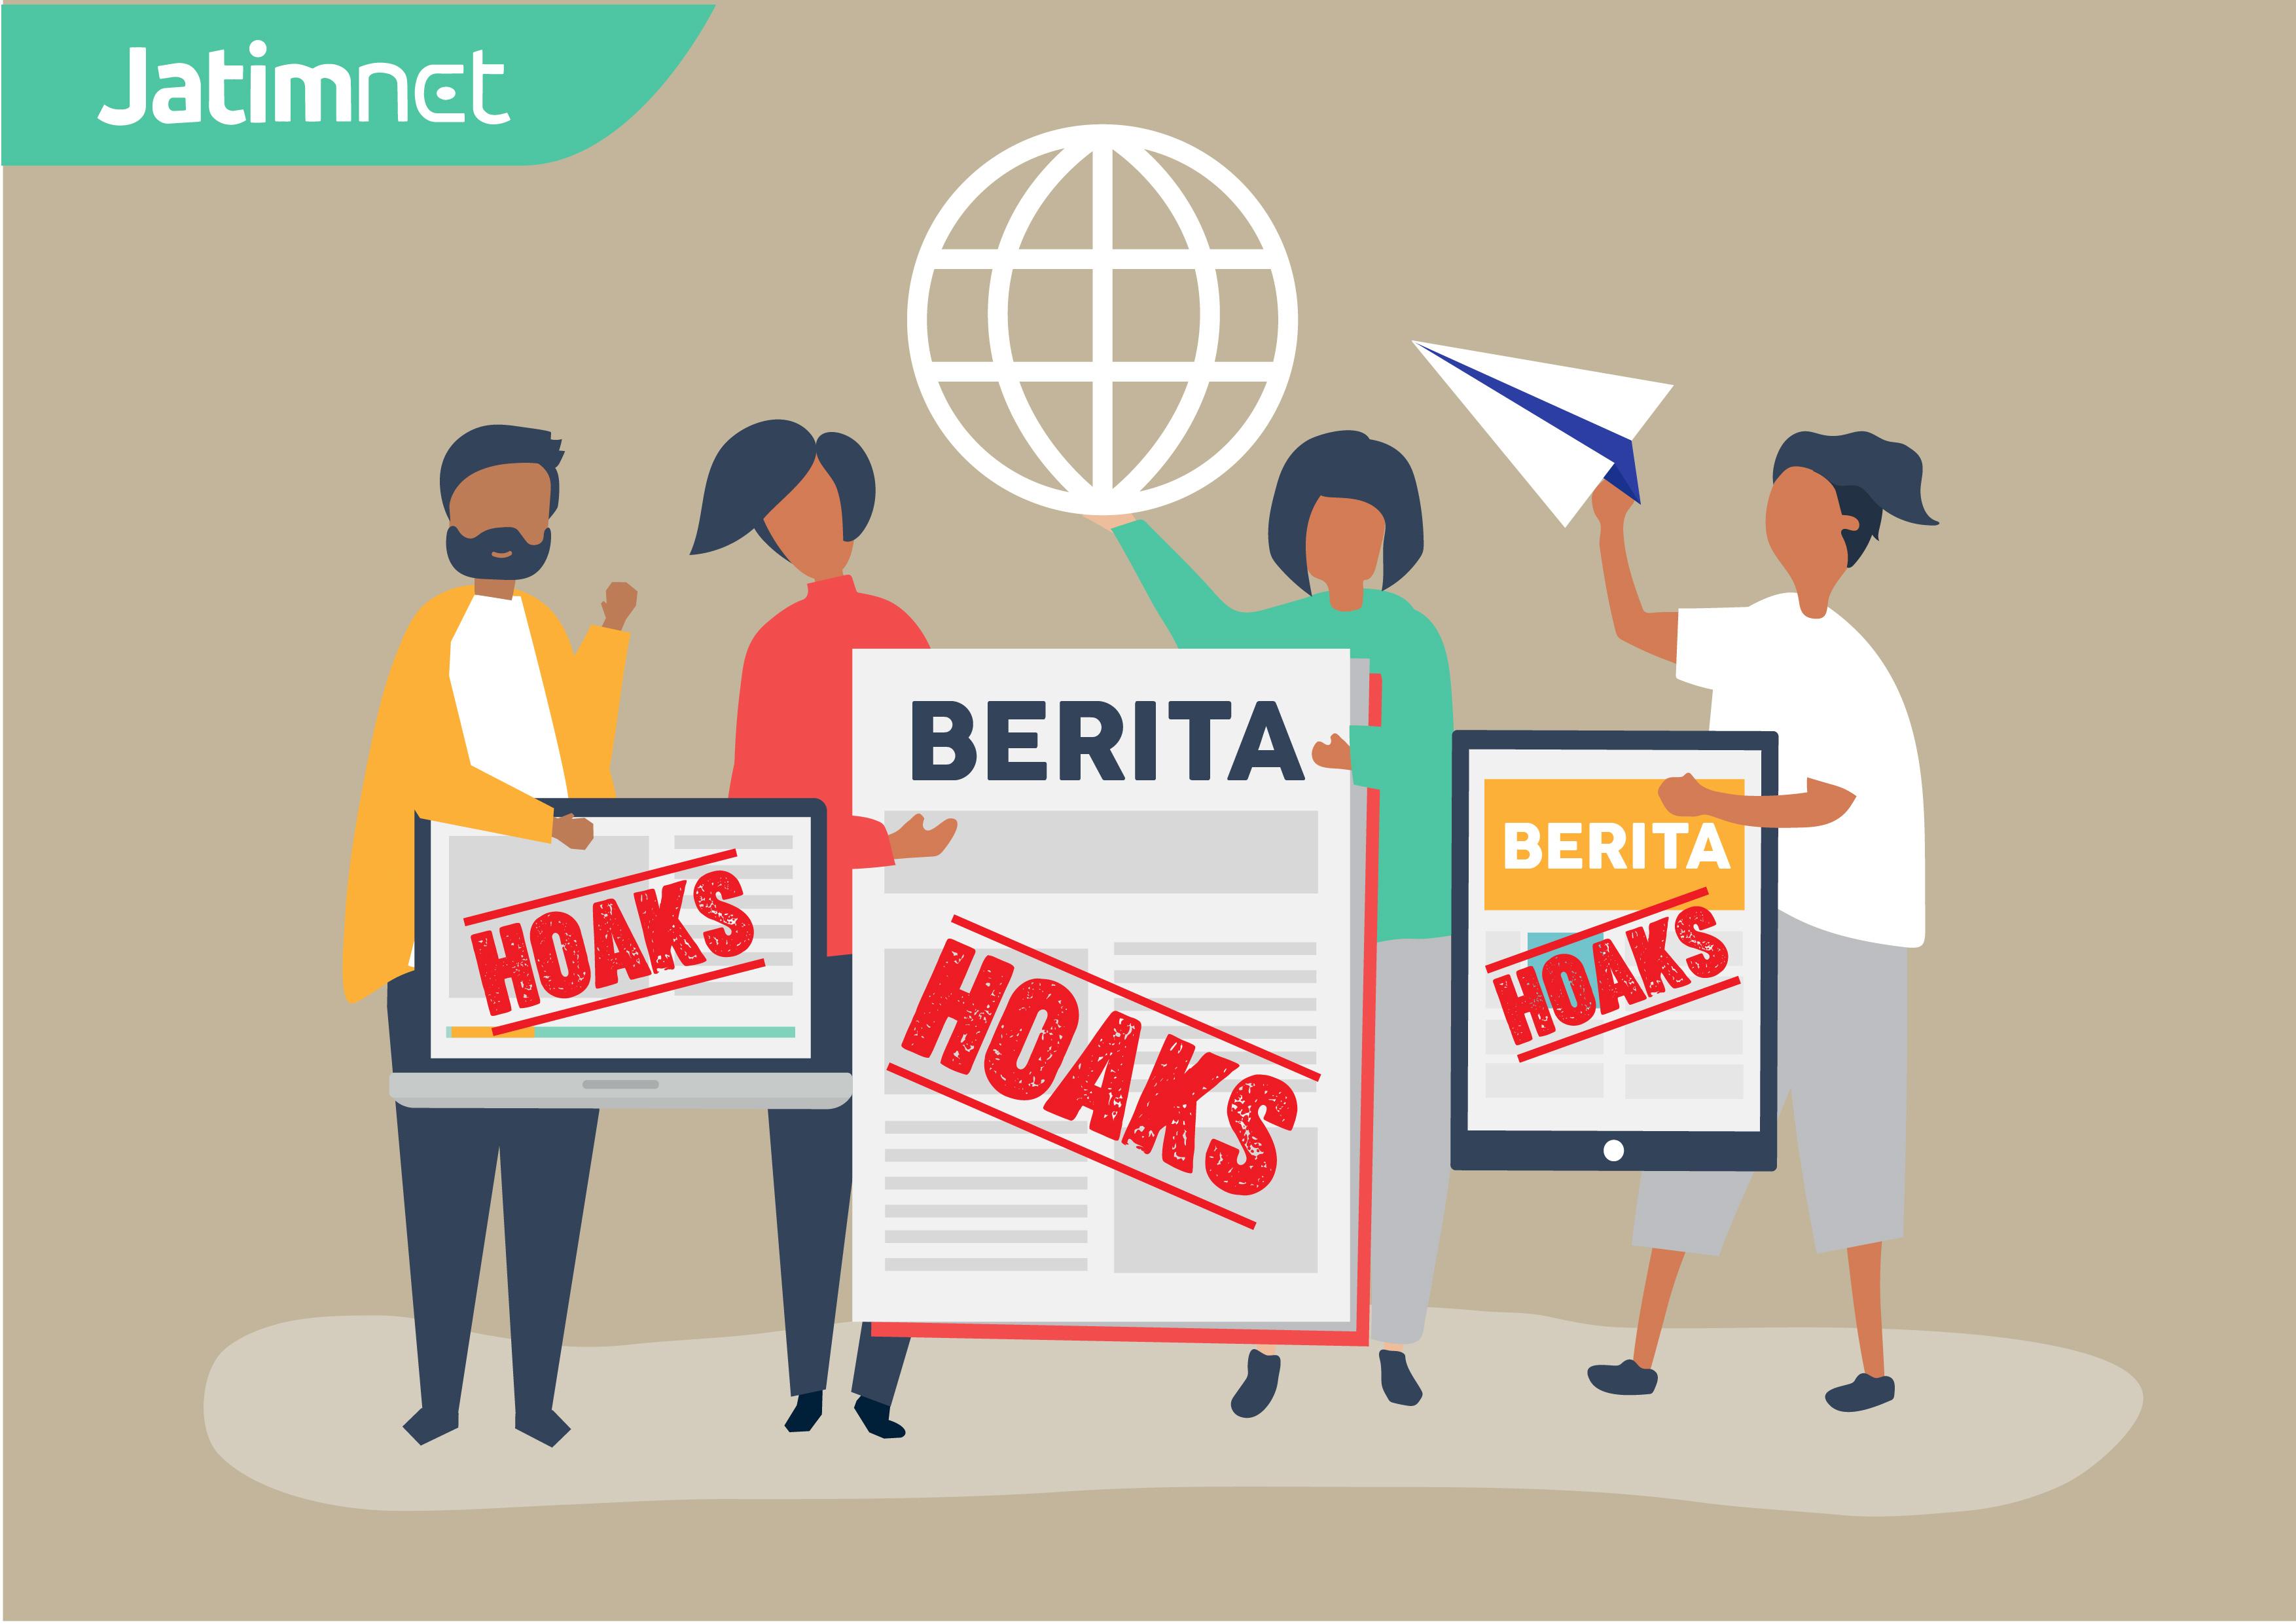 Penyebaran Konten Provokatif Meningkat Pasca Hitung Cepat